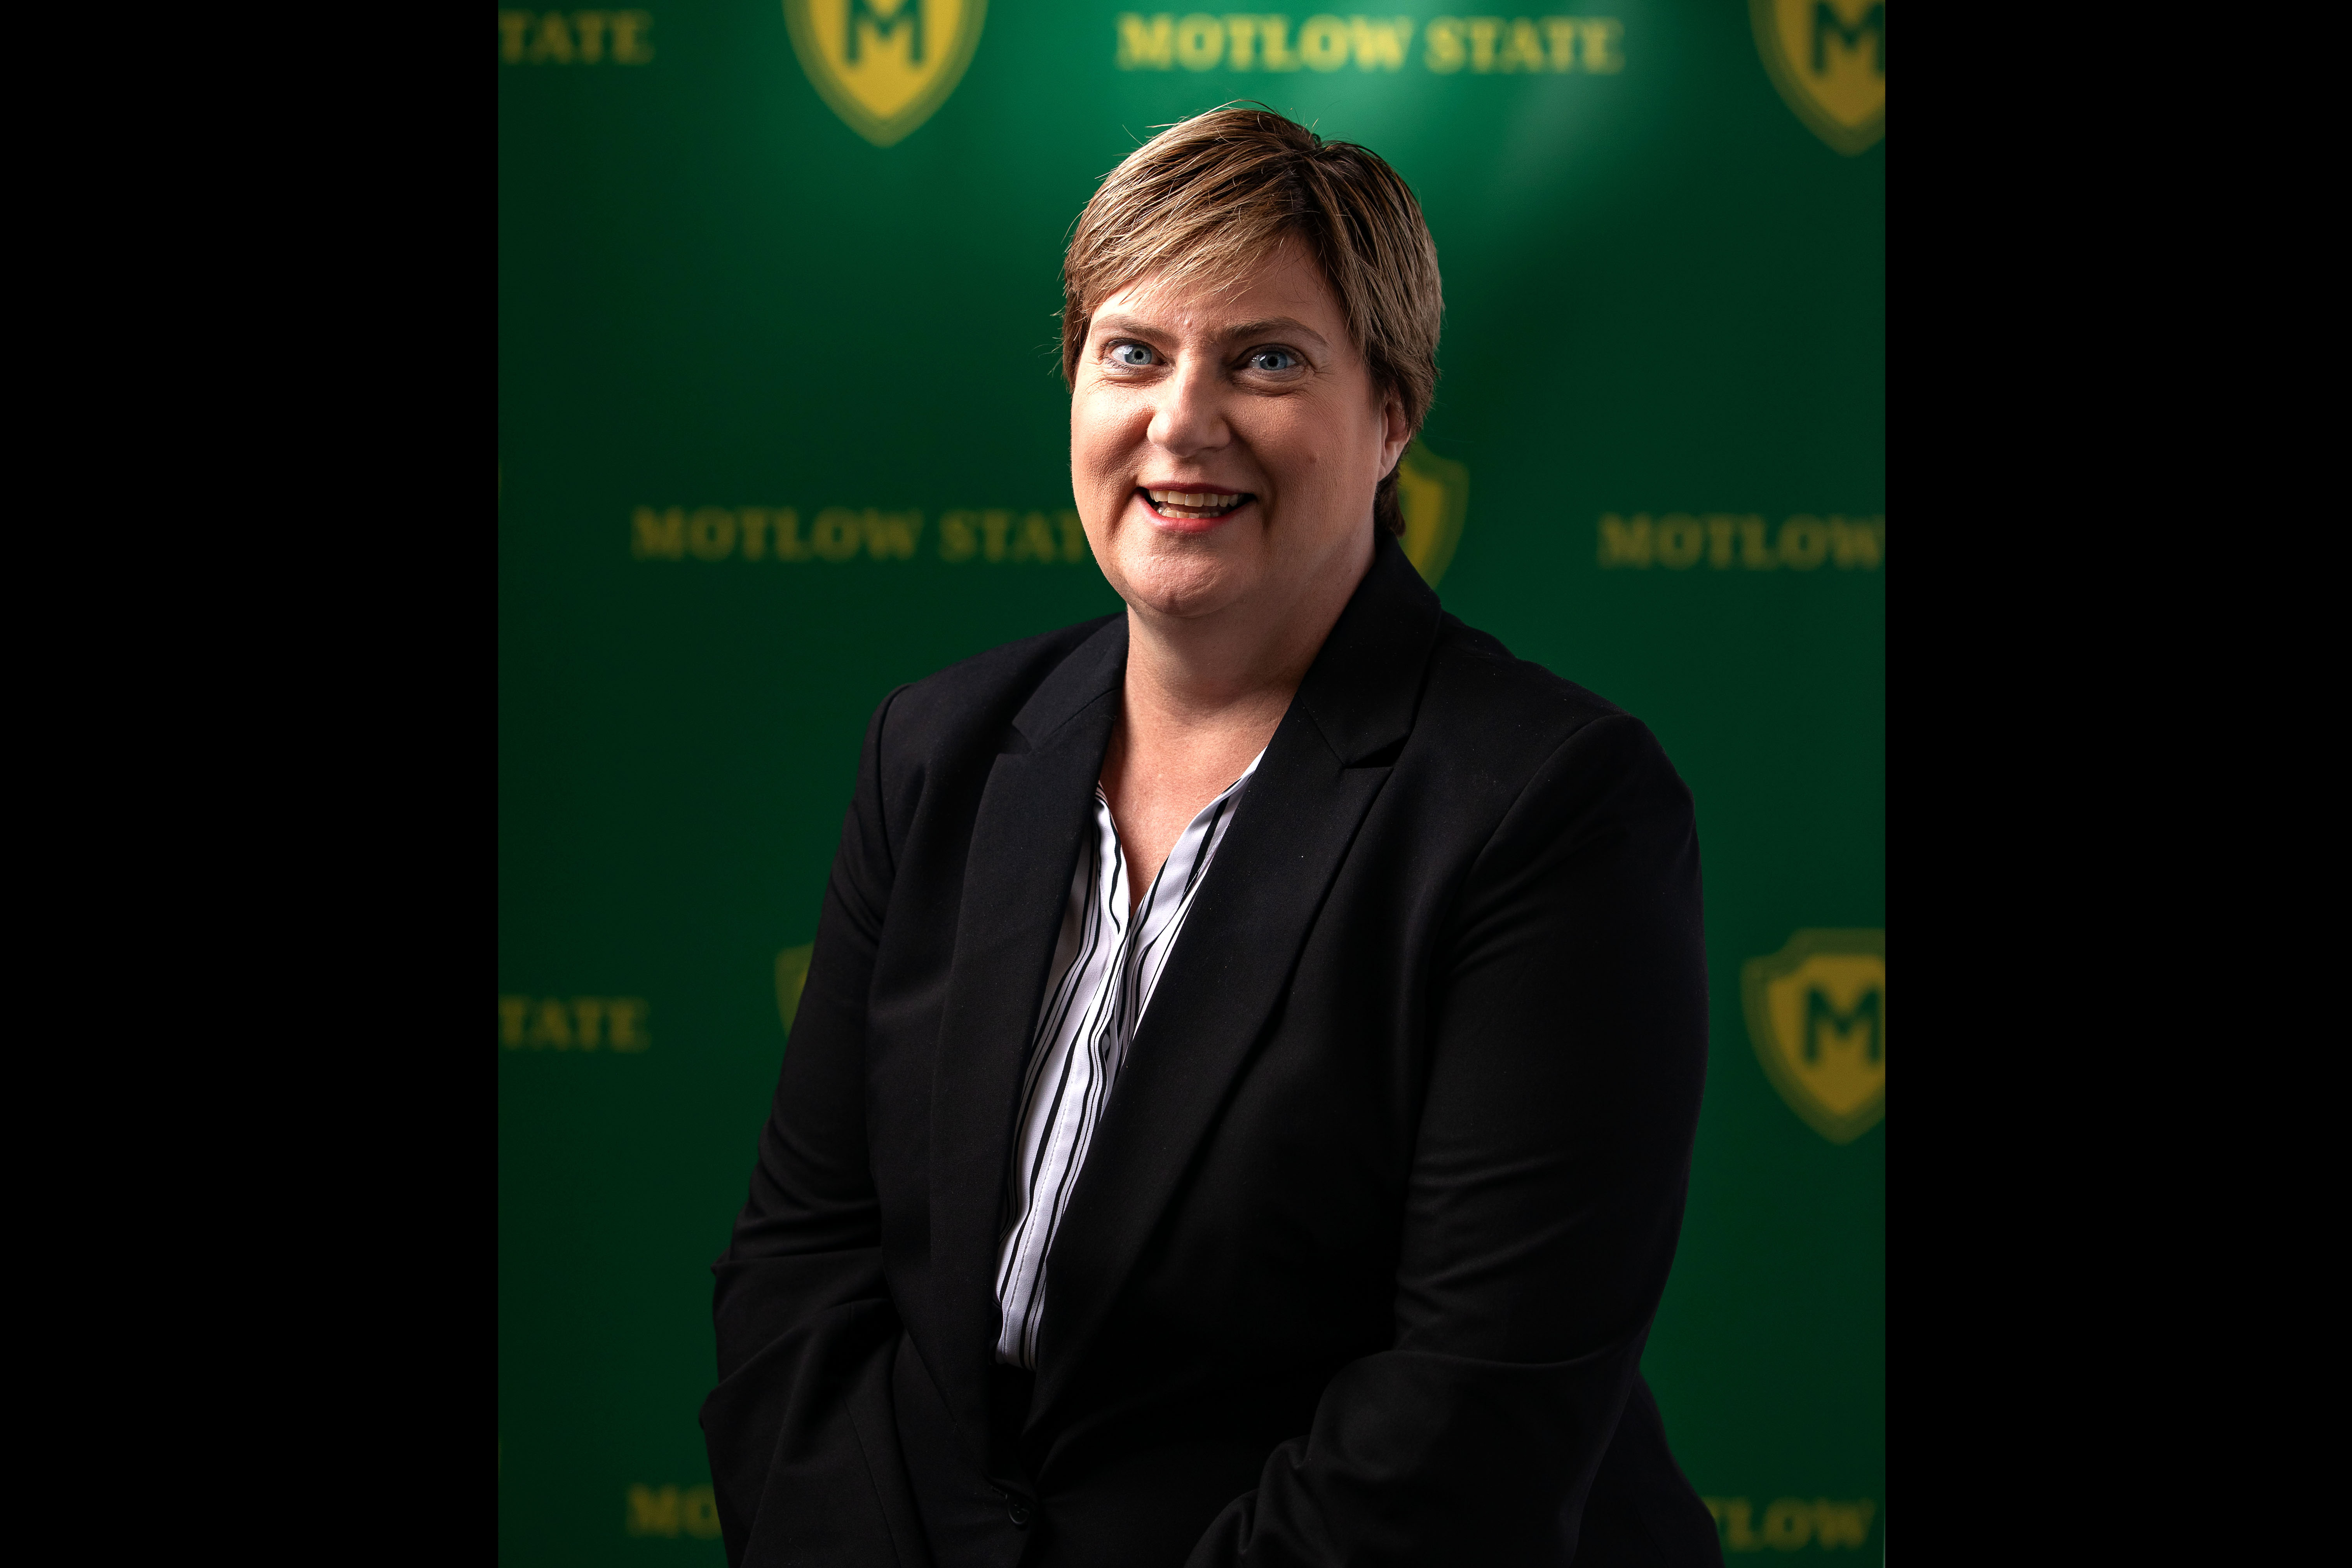 Dr. Amy Holder